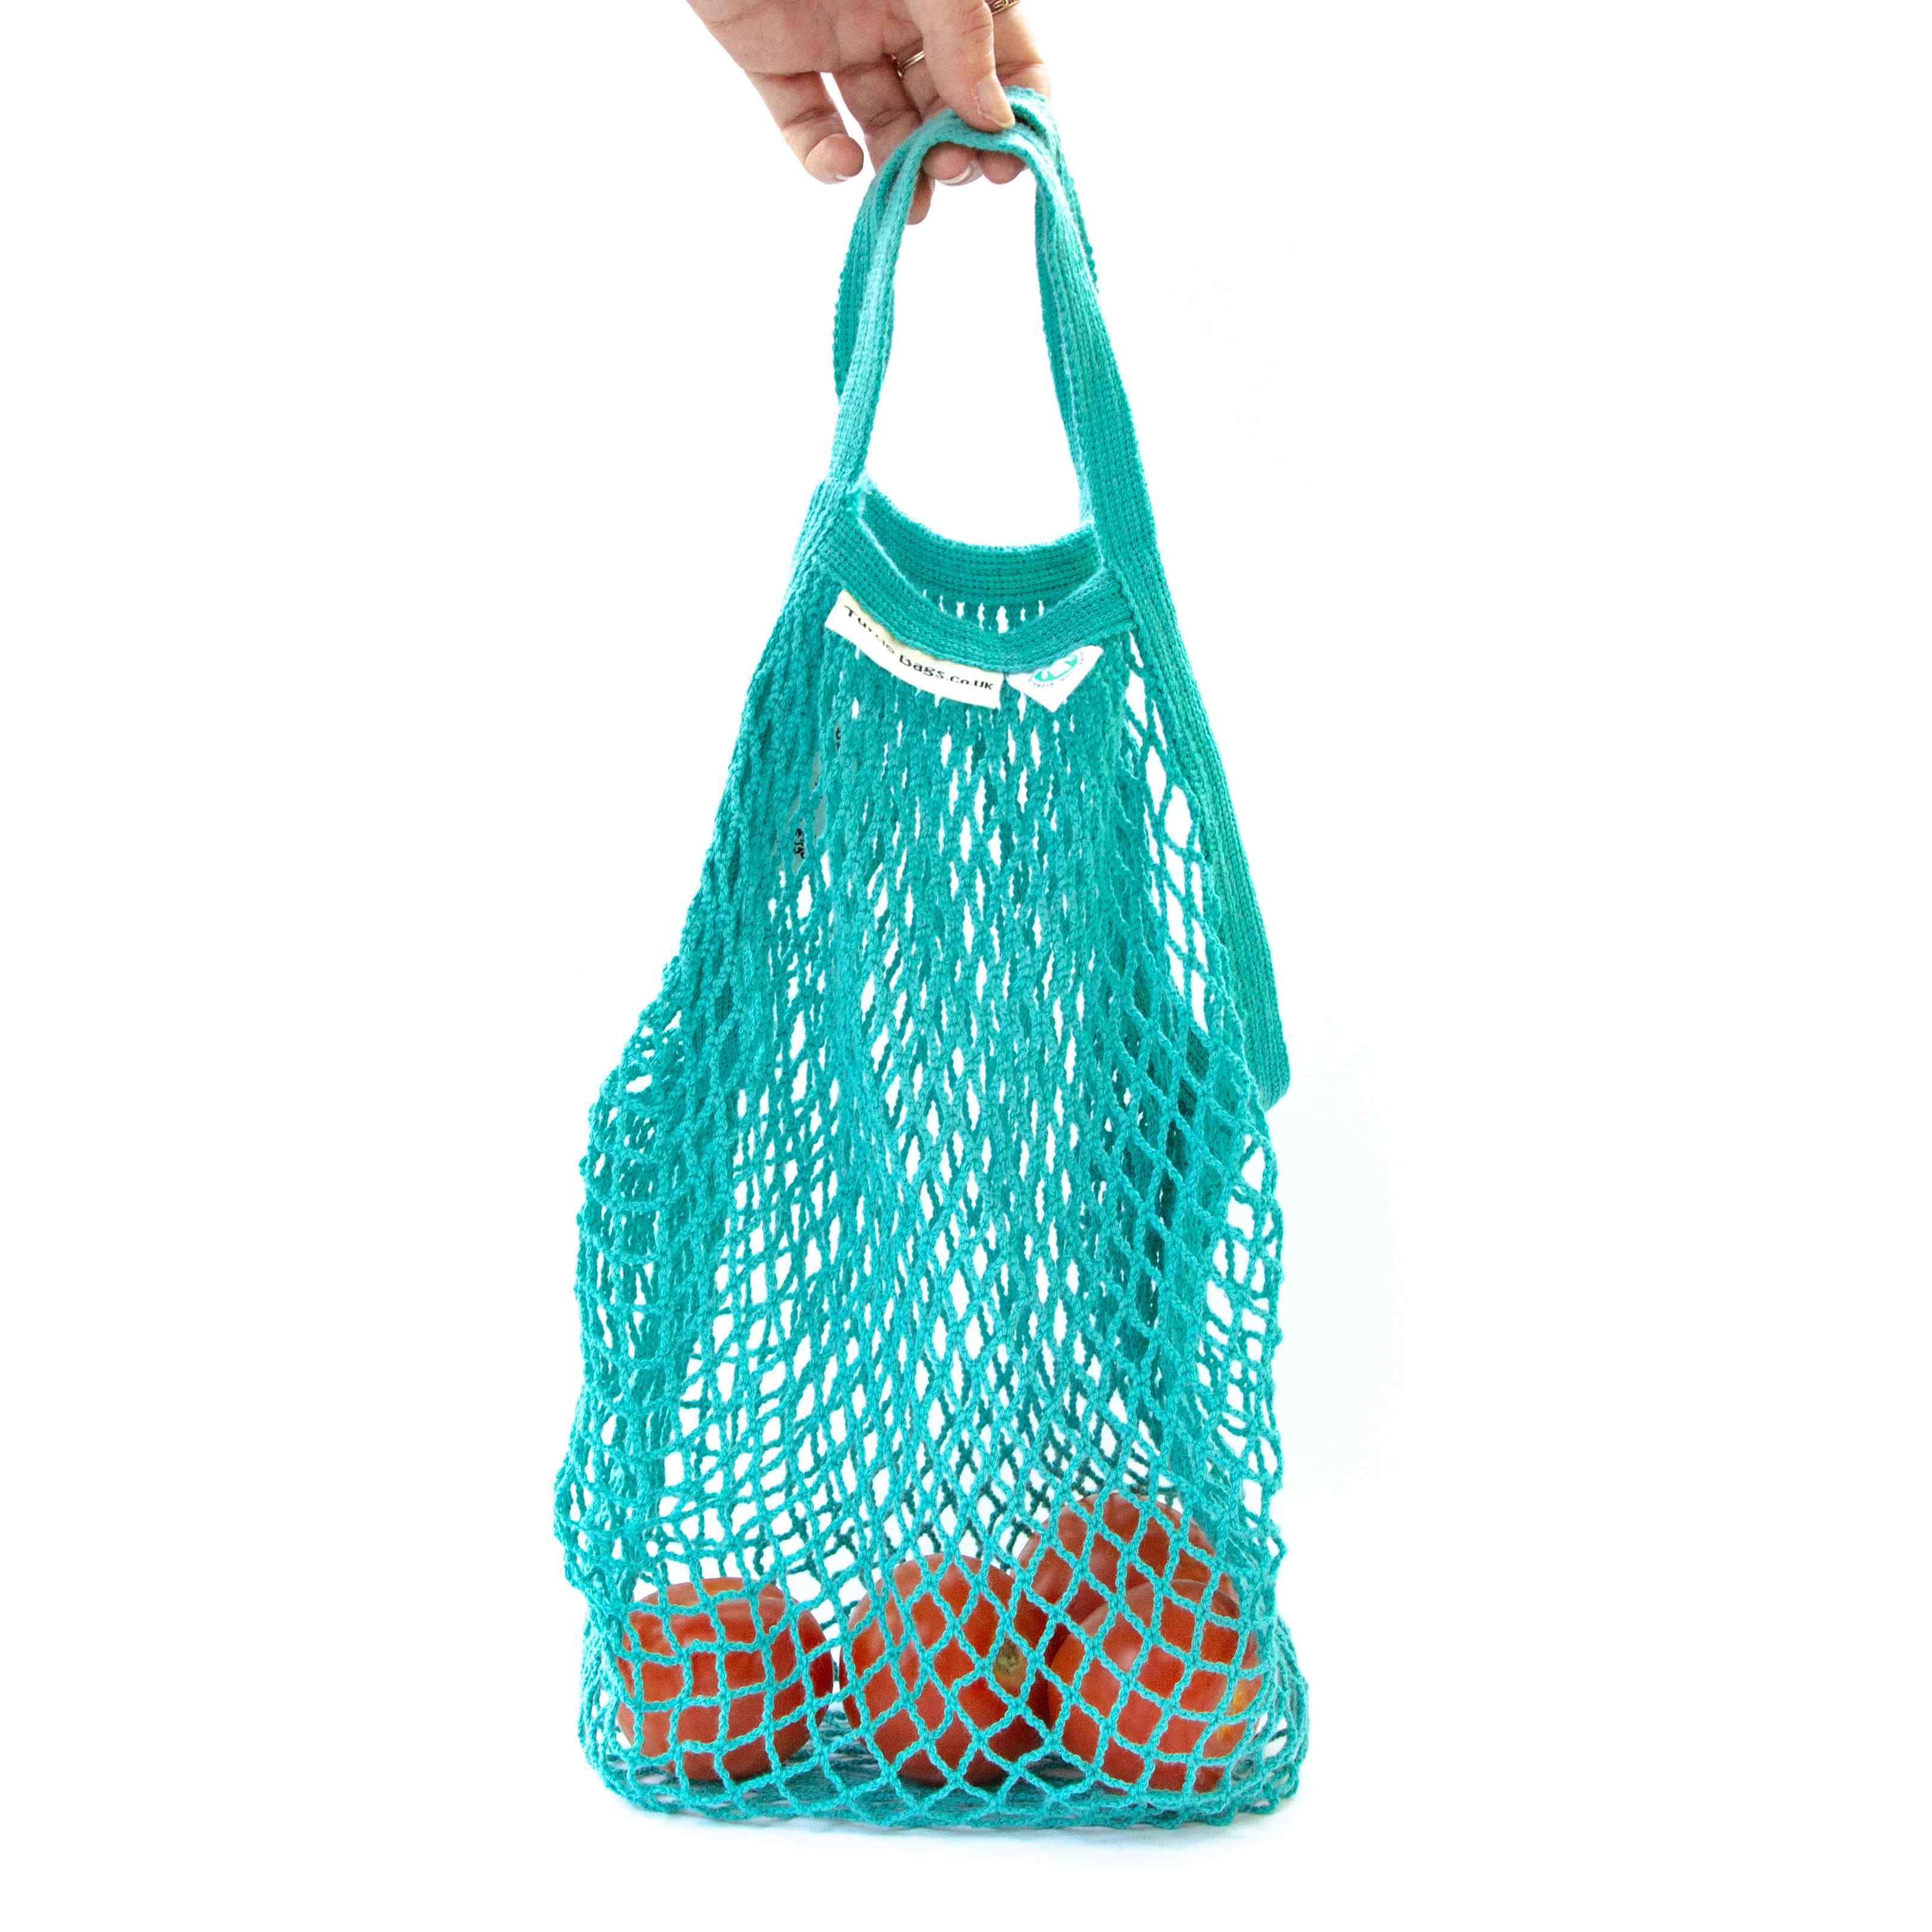 Organic Cotton Bag   Turtle Bags